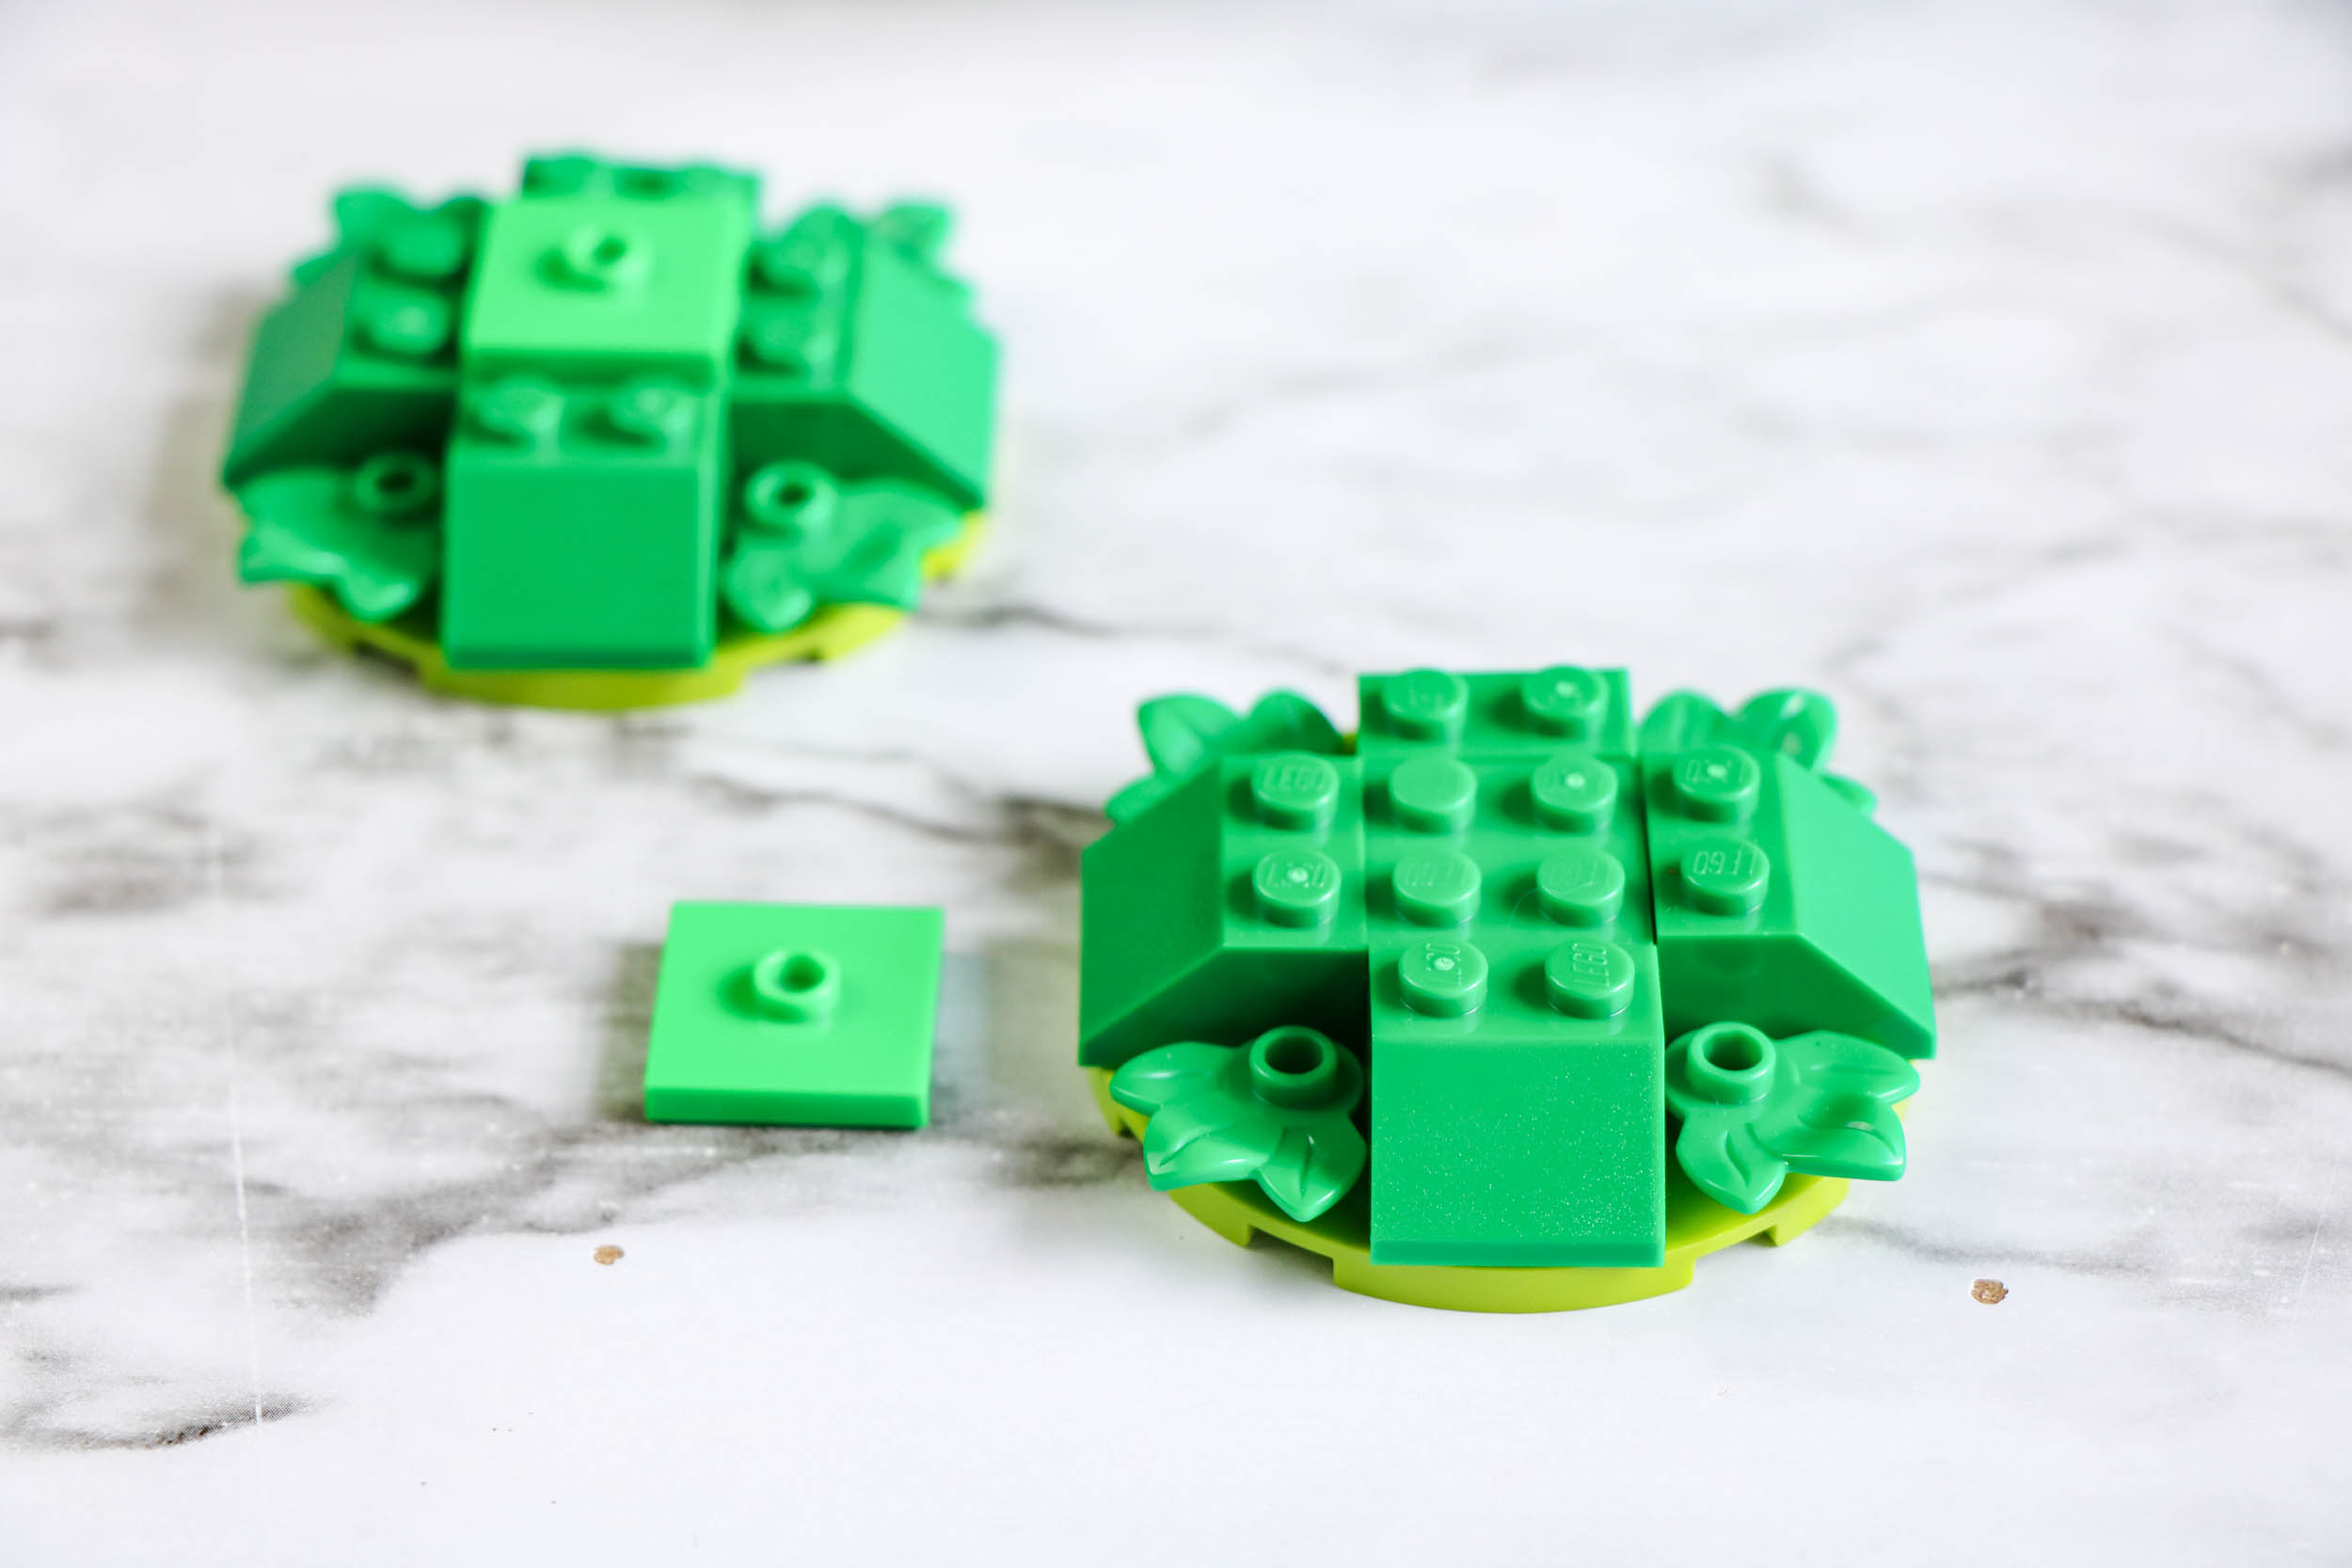 kids lego, lego instructions, lego plans, green lego